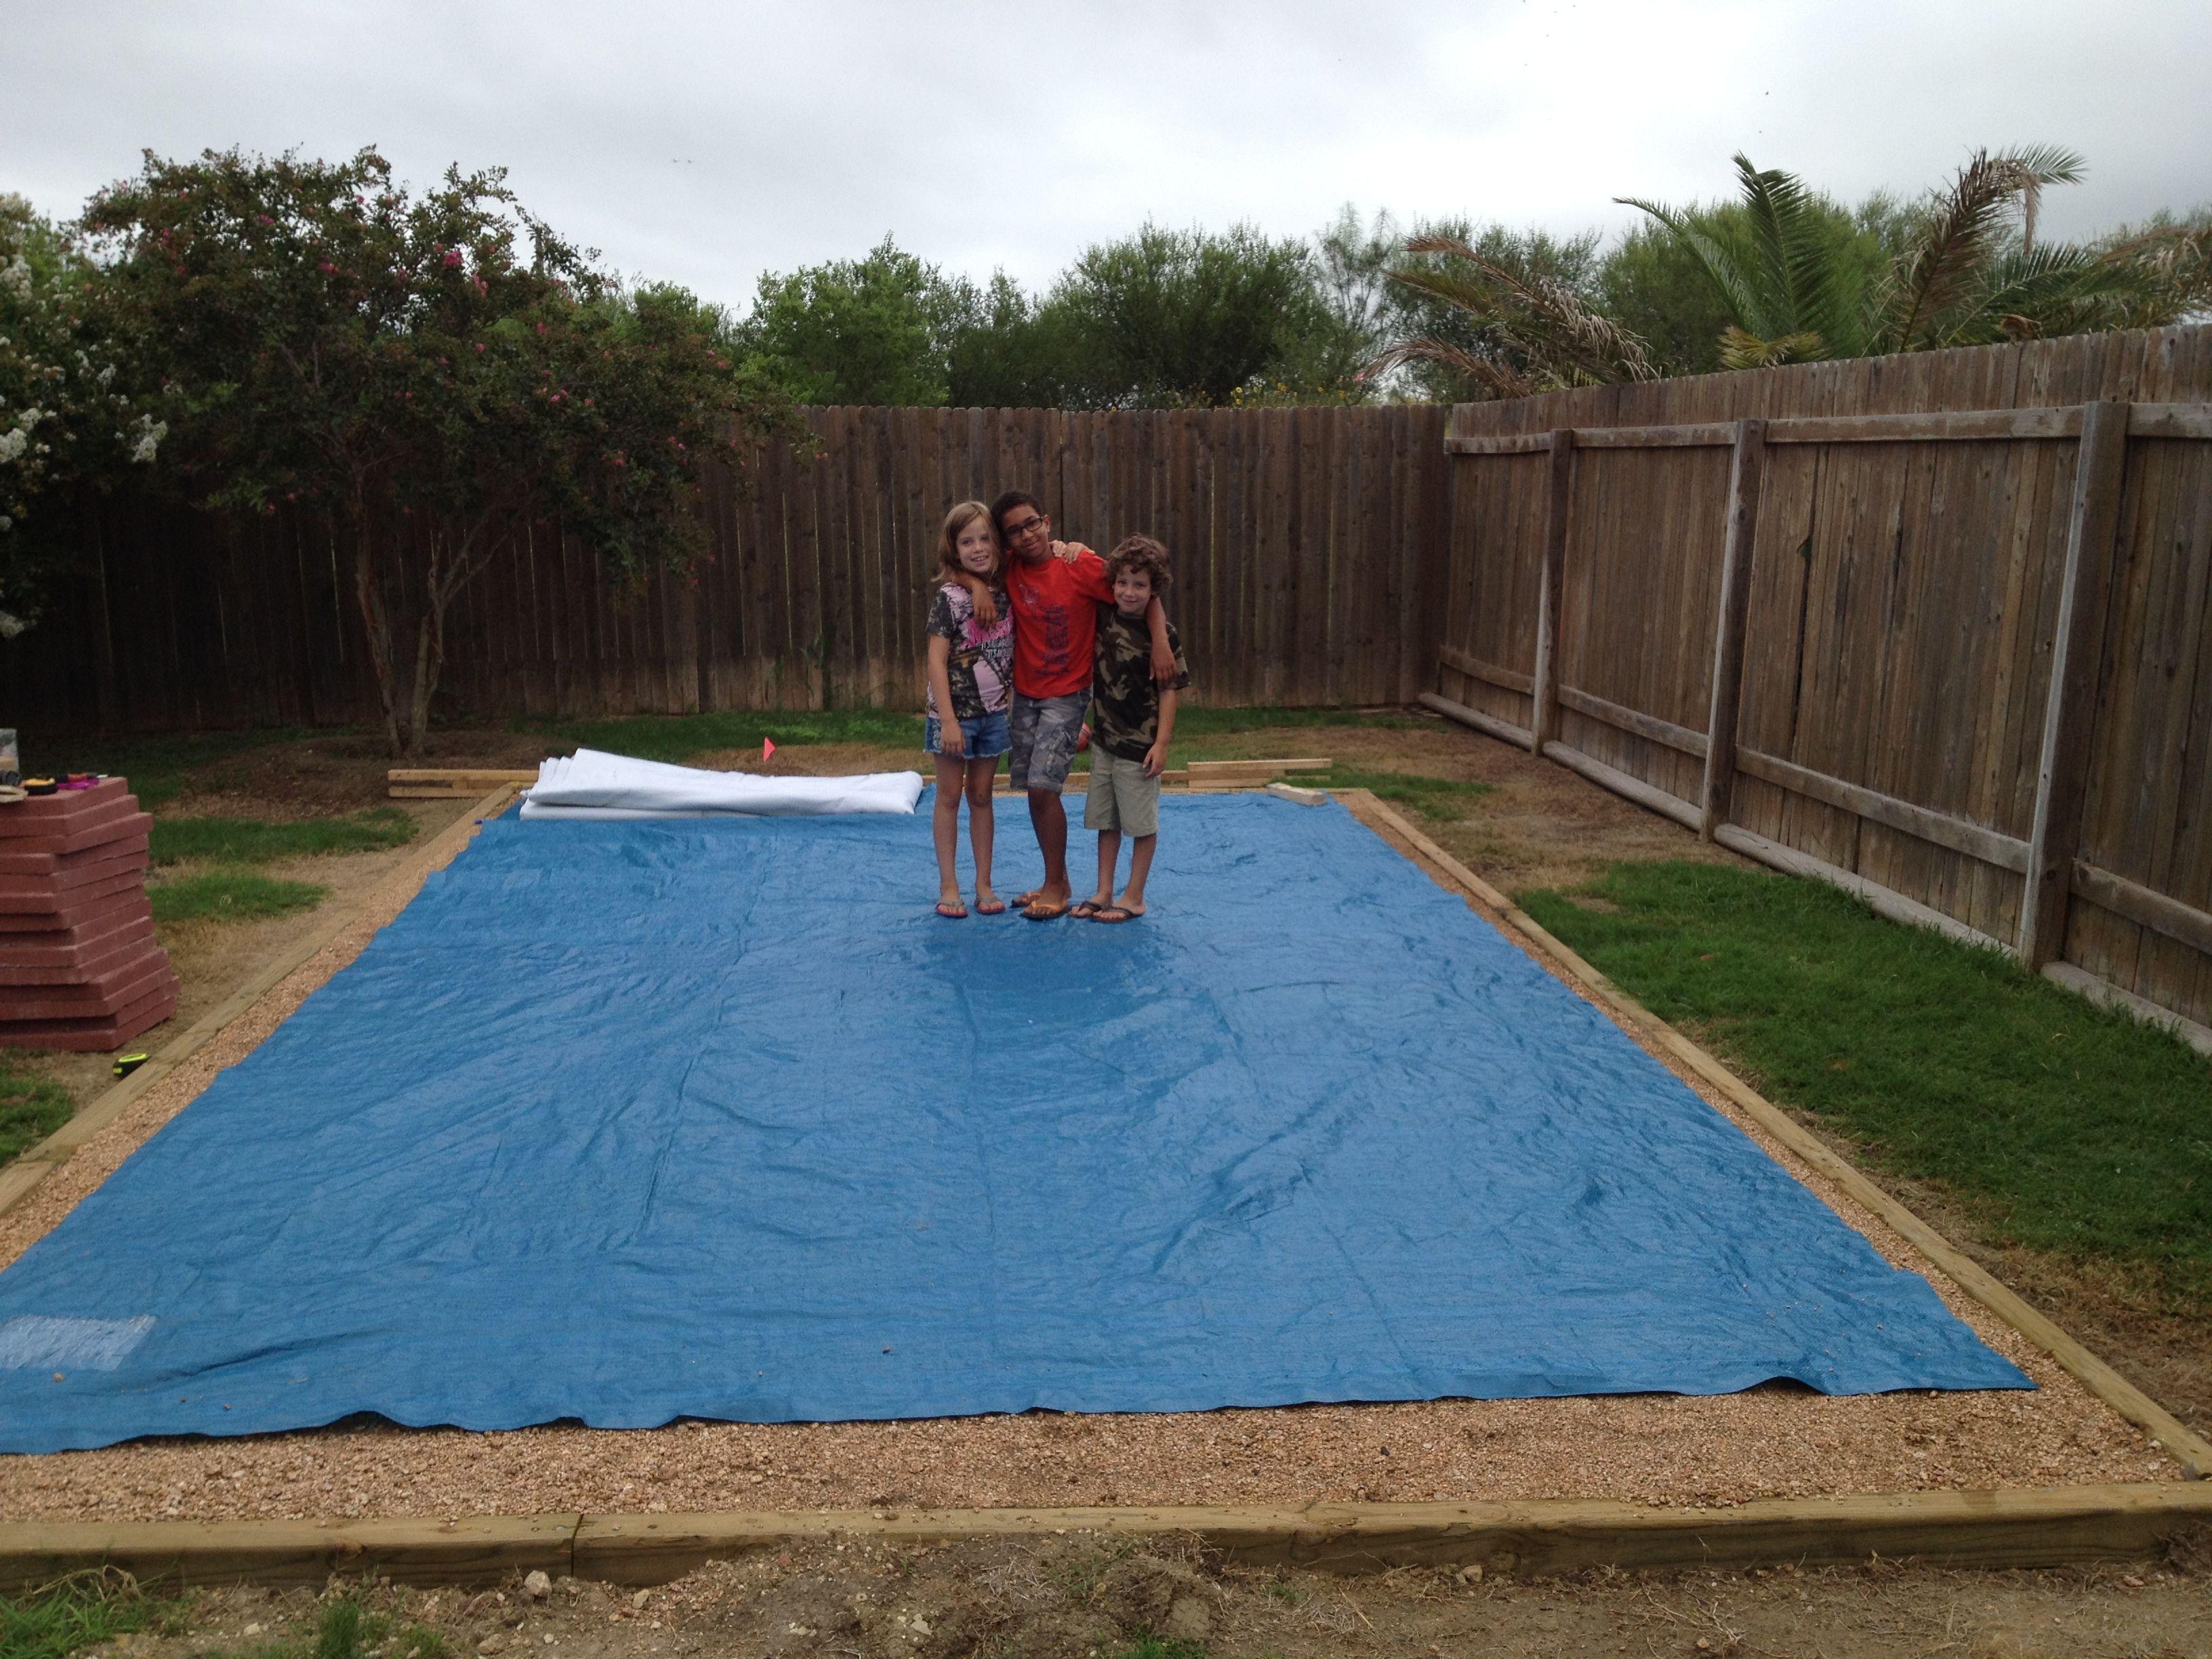 Tarp out getting ready to put gorilla pad down | 9x18 foot Intex ...